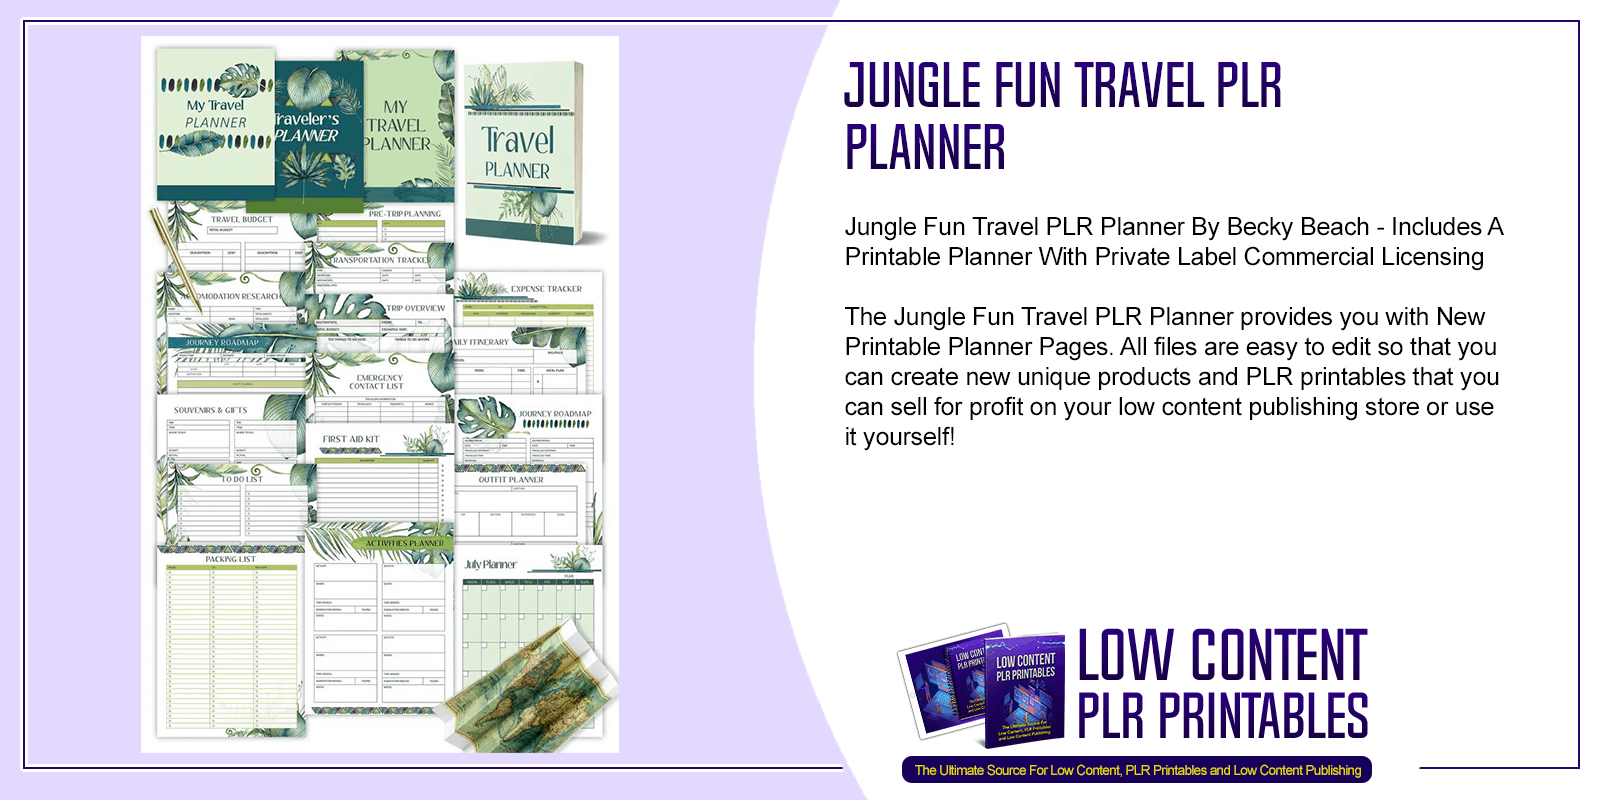 Jungle Fun Travel PLR Planner